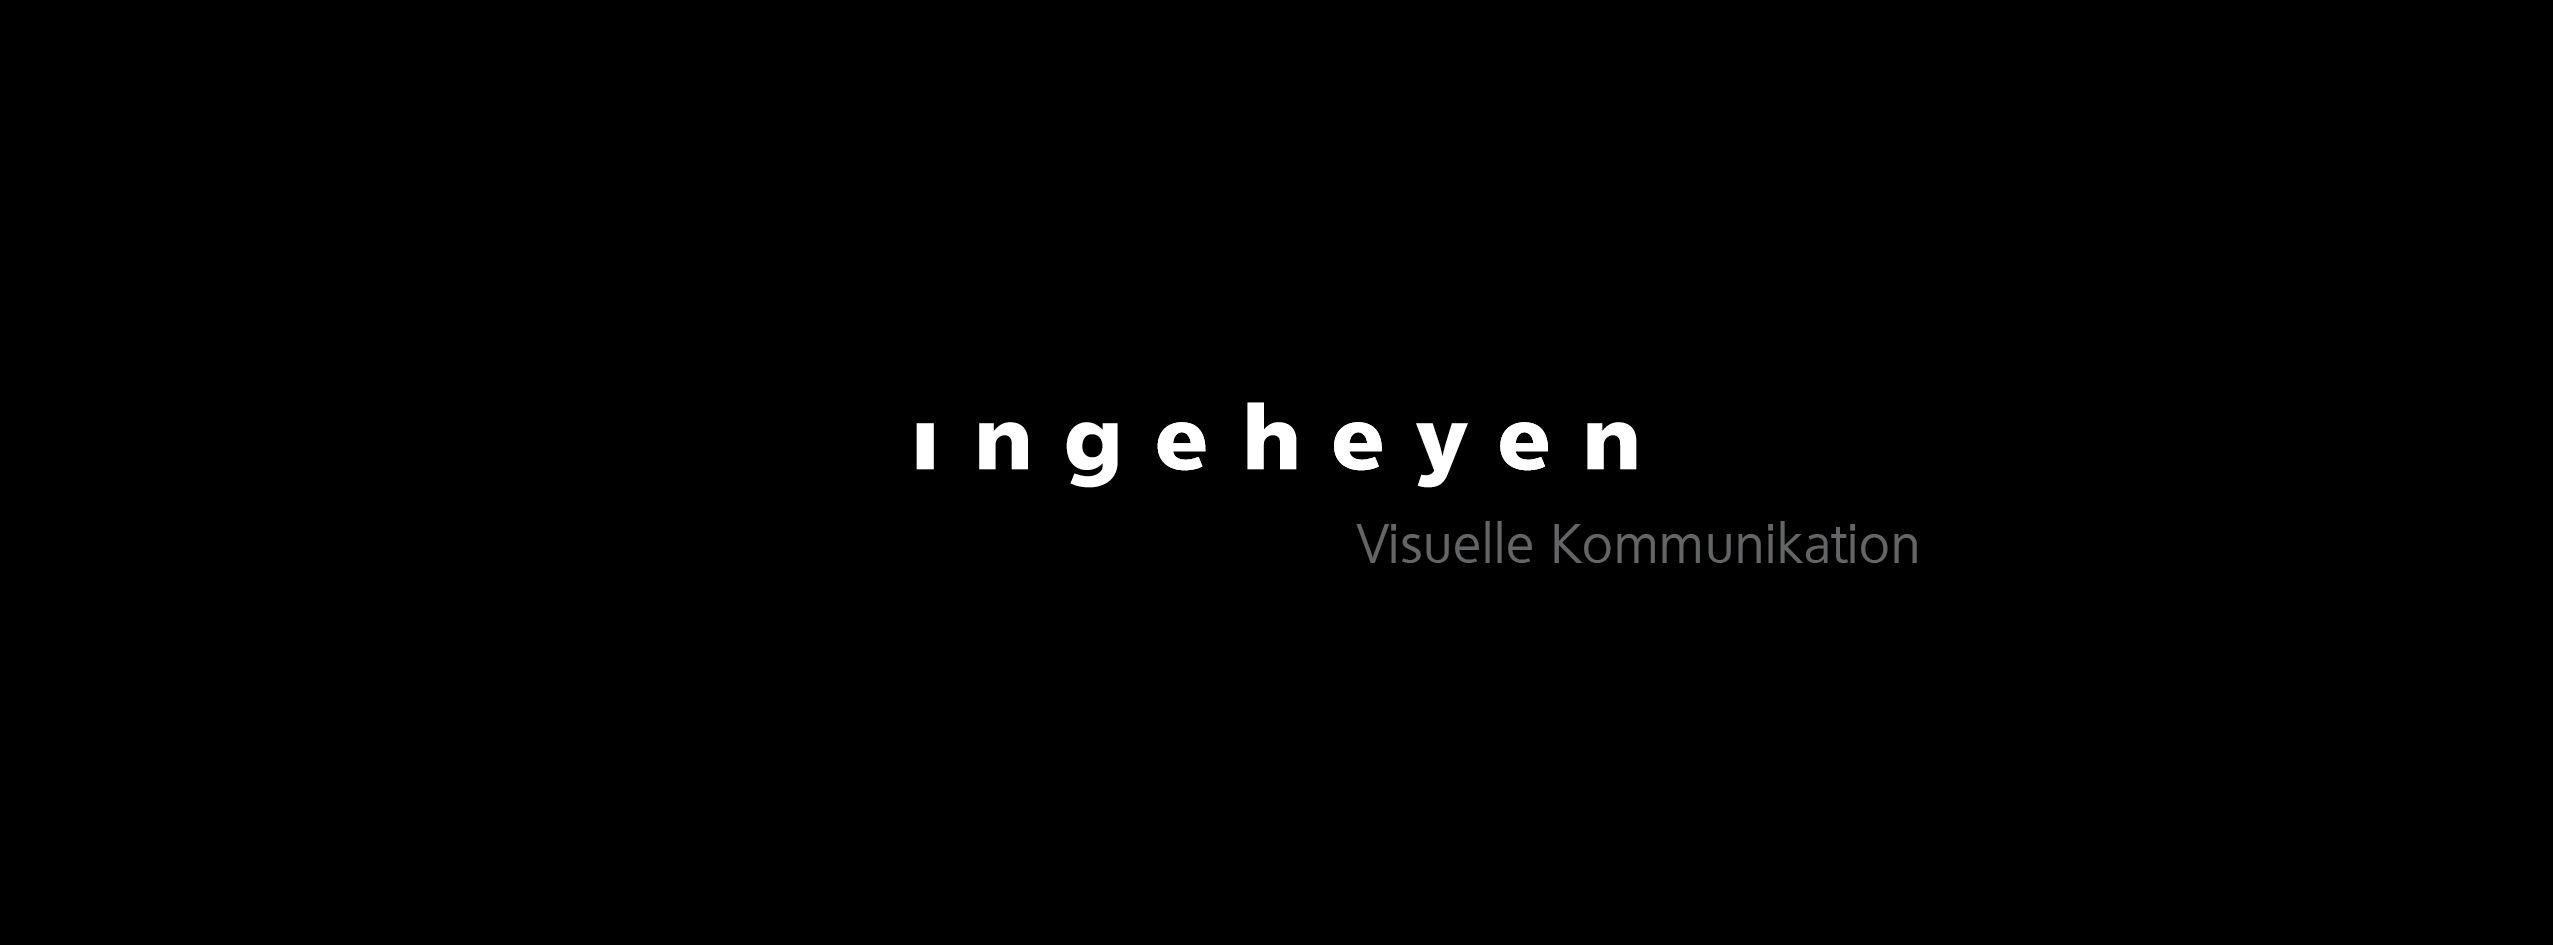 Inge Heyen Visuelle Kommunikation - Inge Heyen